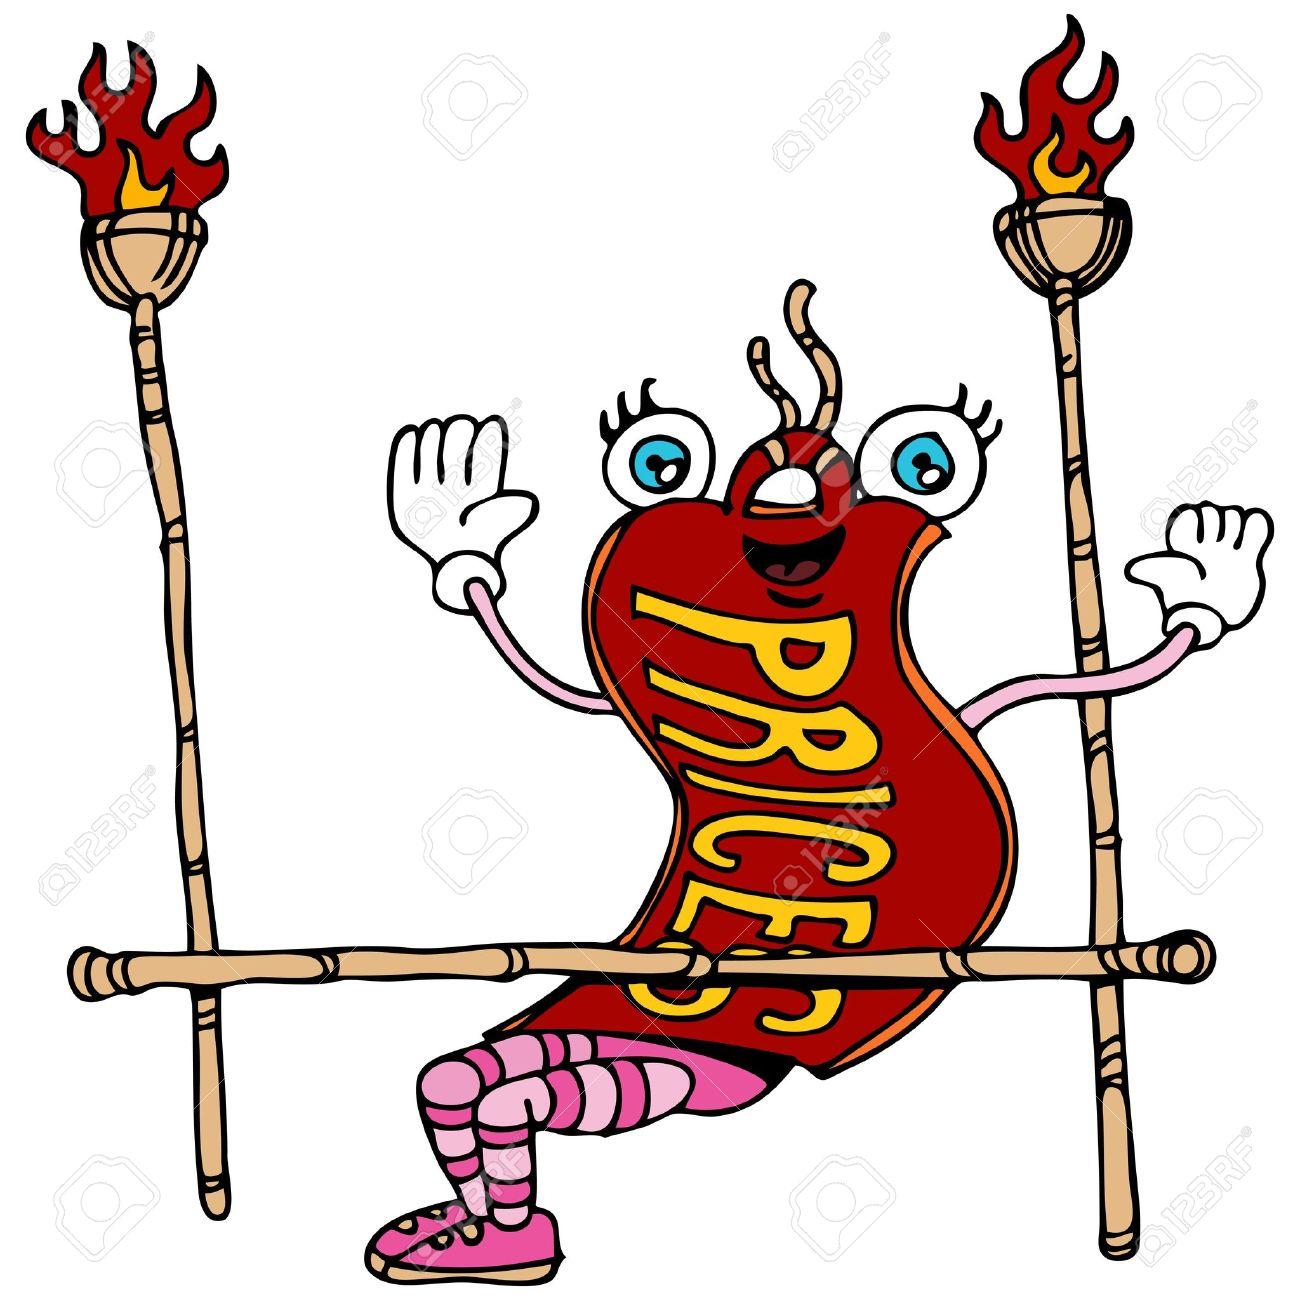 an image of a cartoon price tag limbo dancing royalty free cliparts rh 123rf com limbo clipart